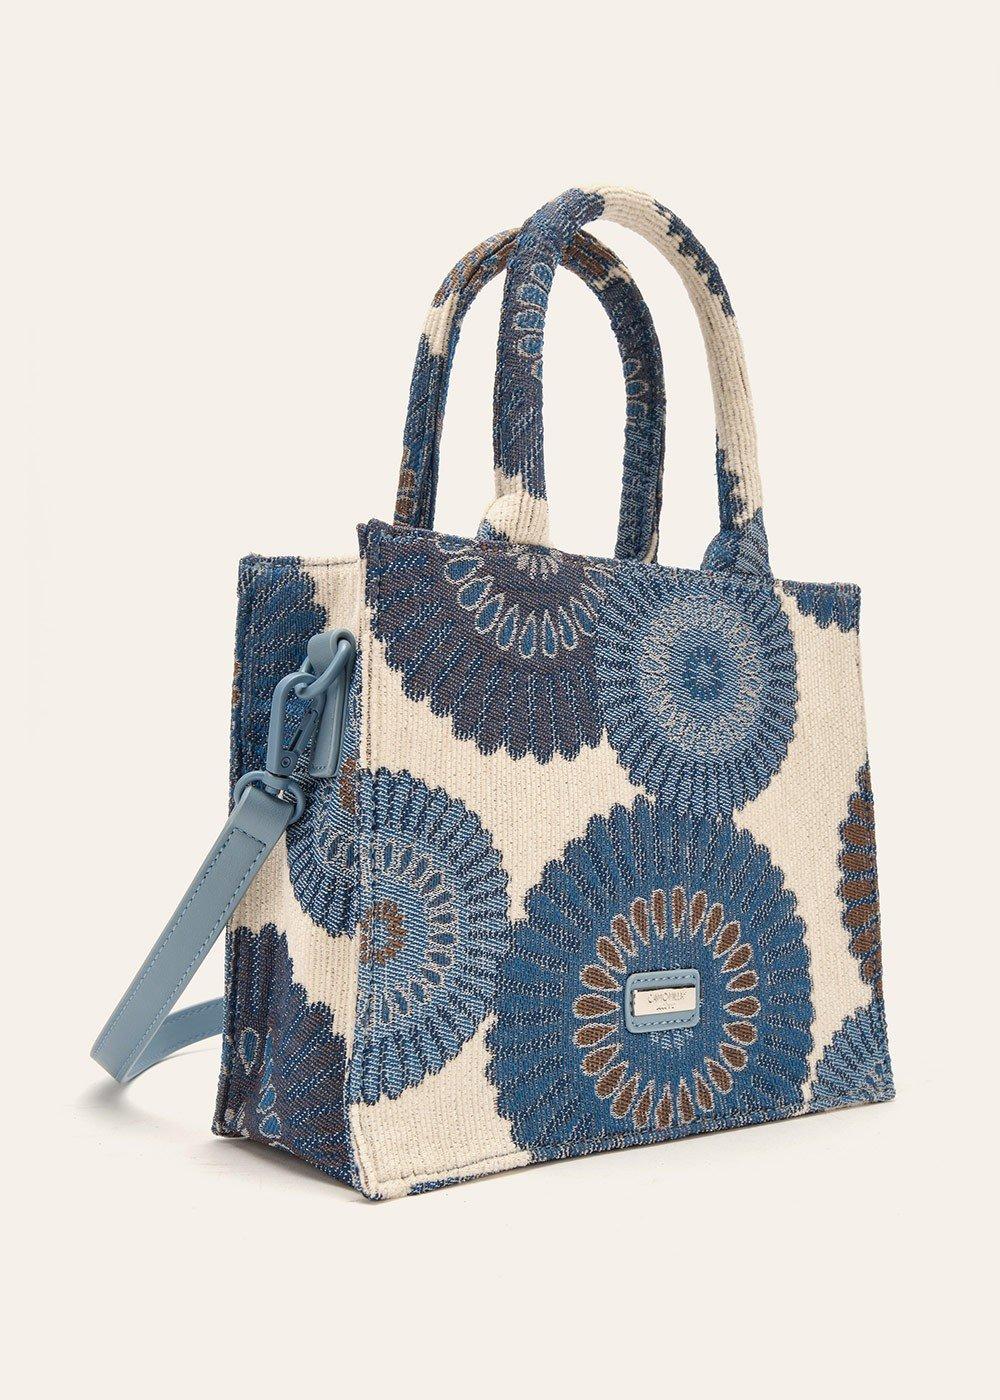 Minibag Brandy tessuto jacquard - Avion Fantasia - Donna